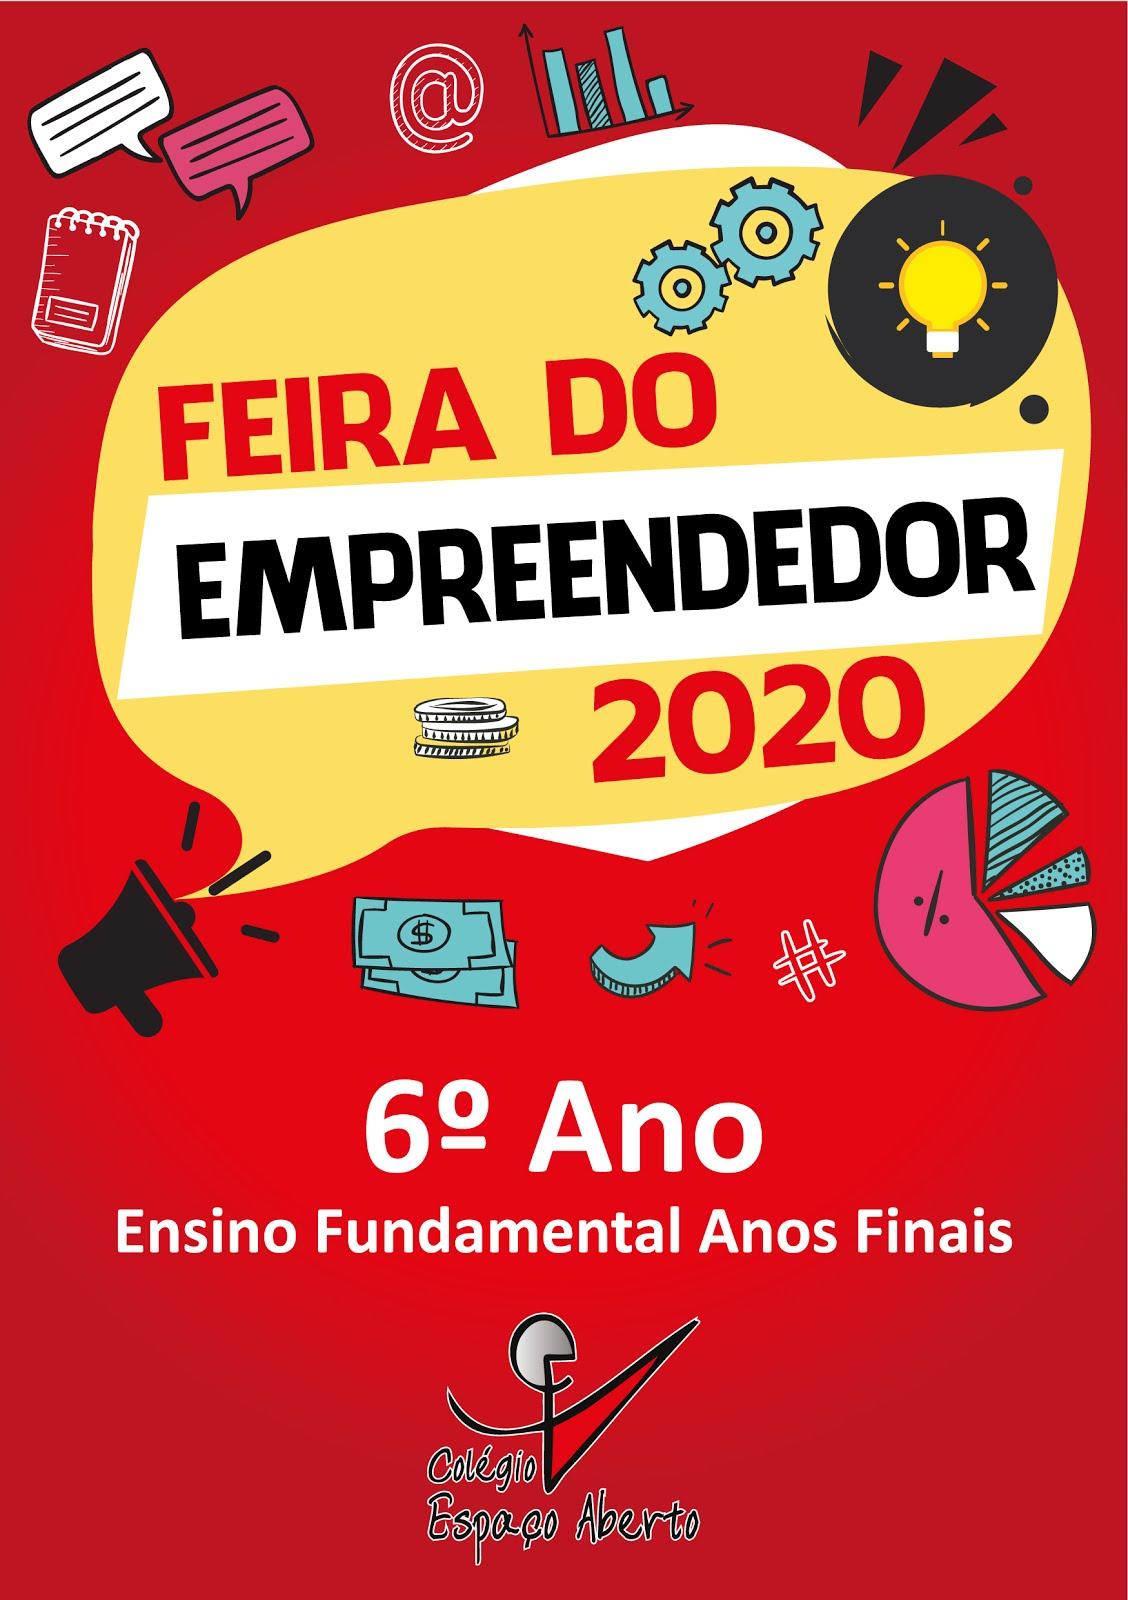 Feira do Empreendedor 2020